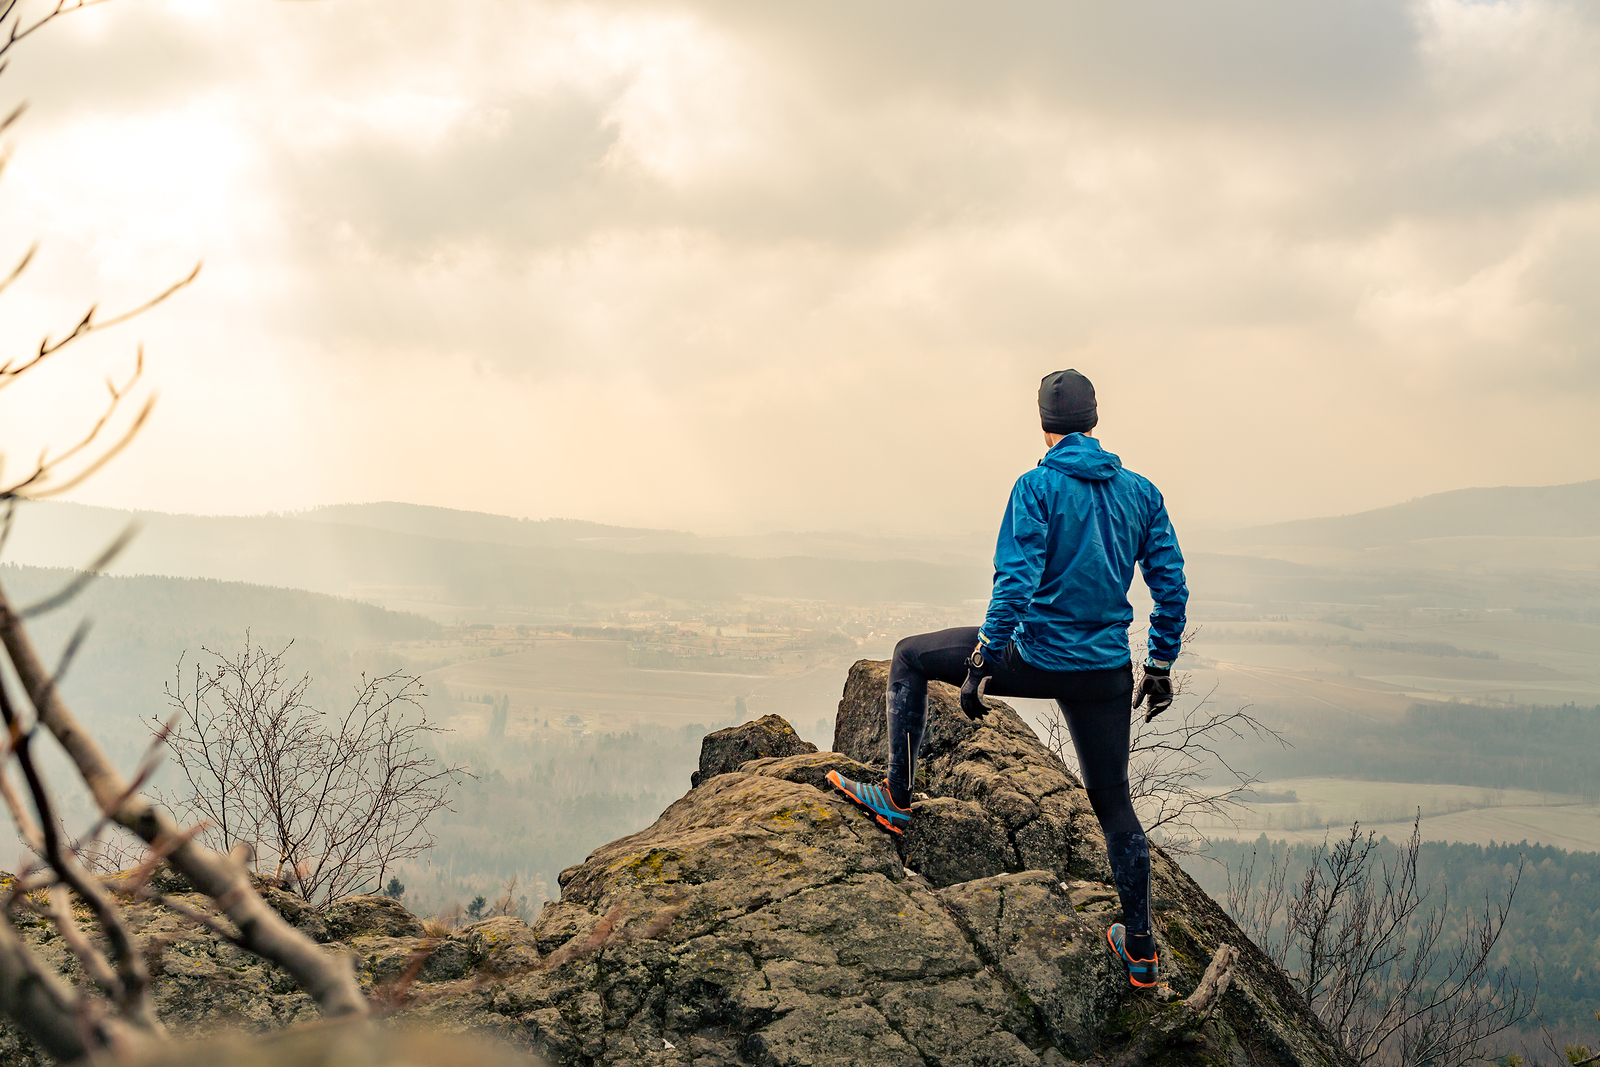 Man who has found help through counseling | Men's Therapy | Tulsa, OK 74114